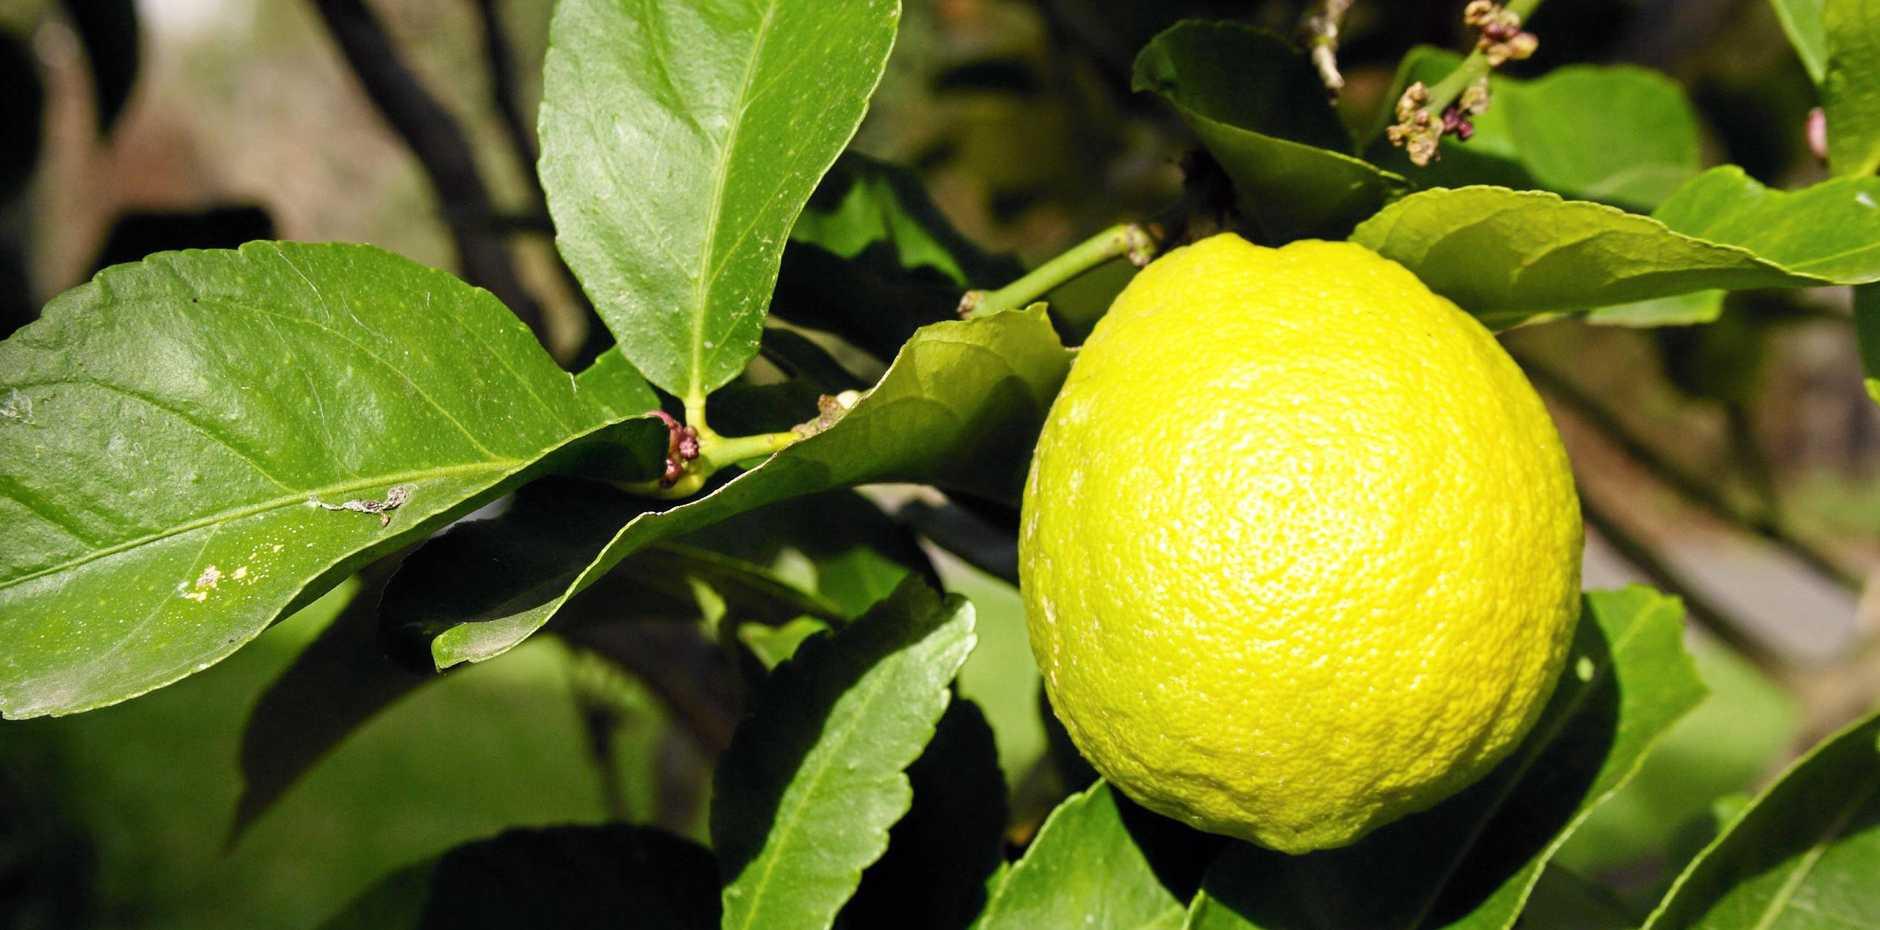 Eureka lemon ripening on the tree in the morning sun.